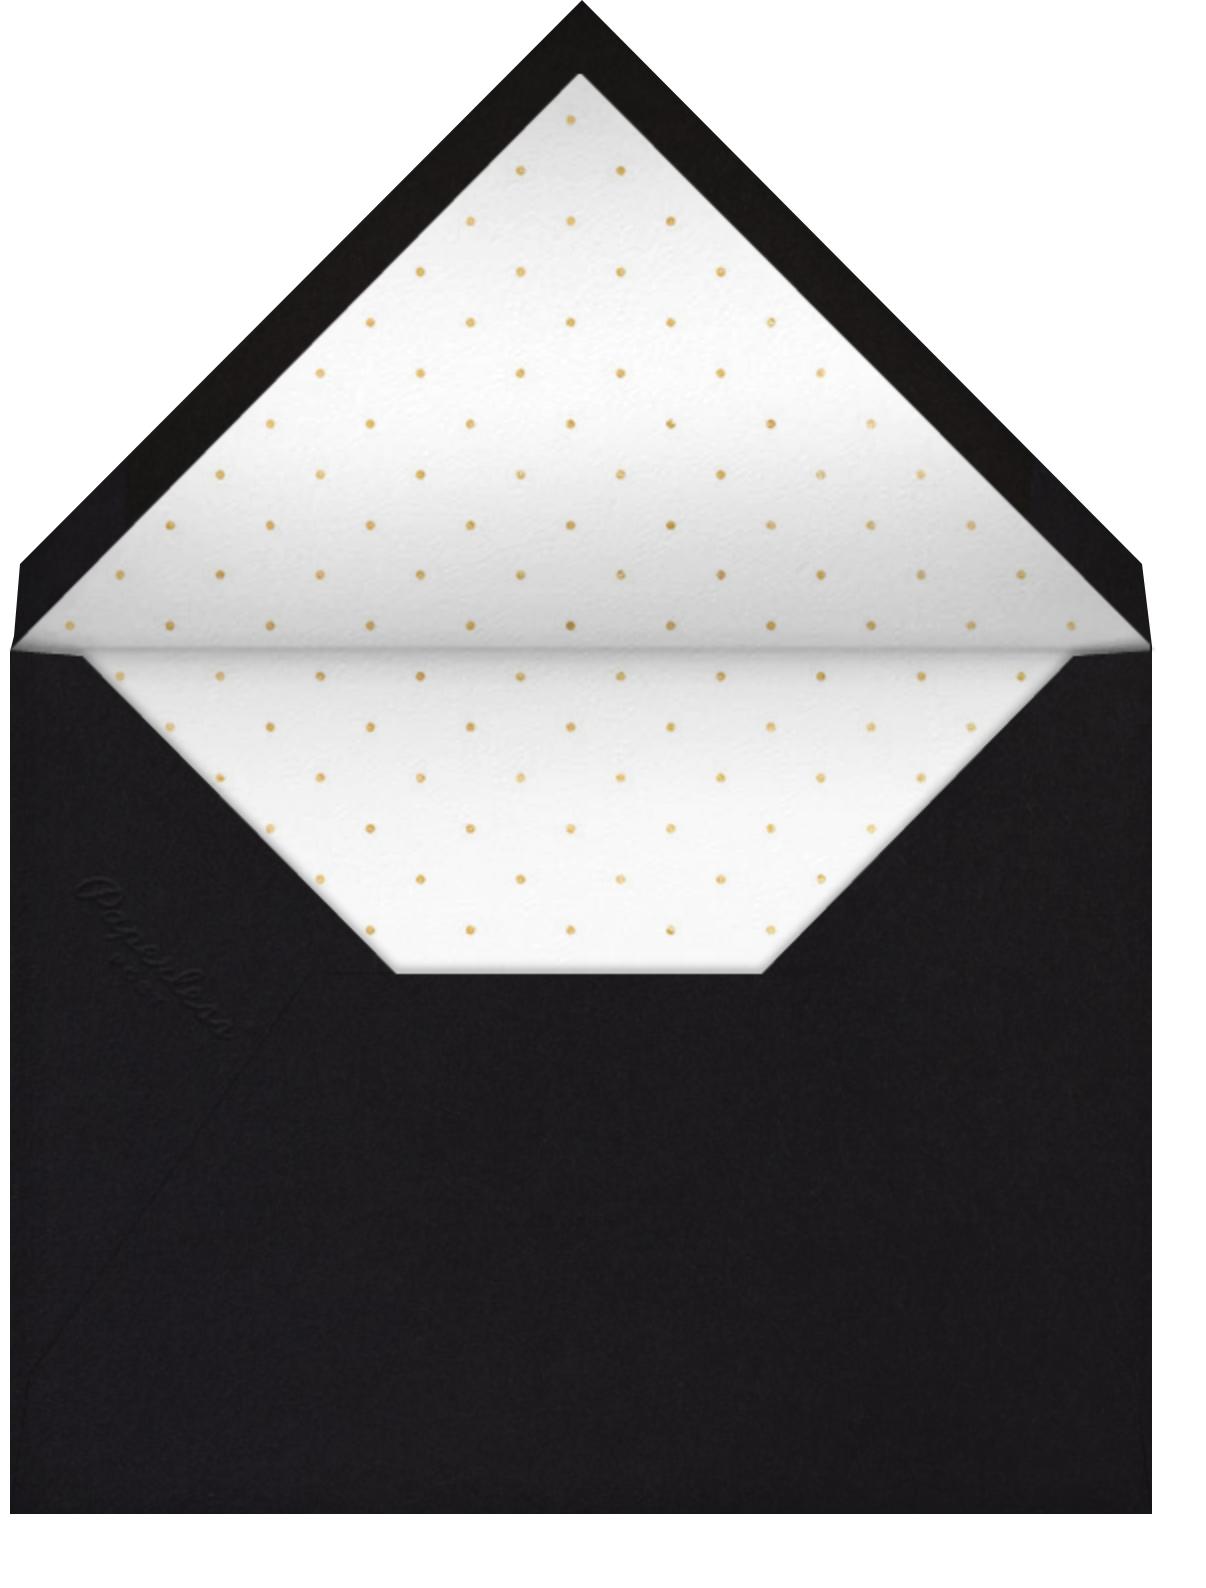 Matte - Black - Paperless Post - Engagement party - envelope back